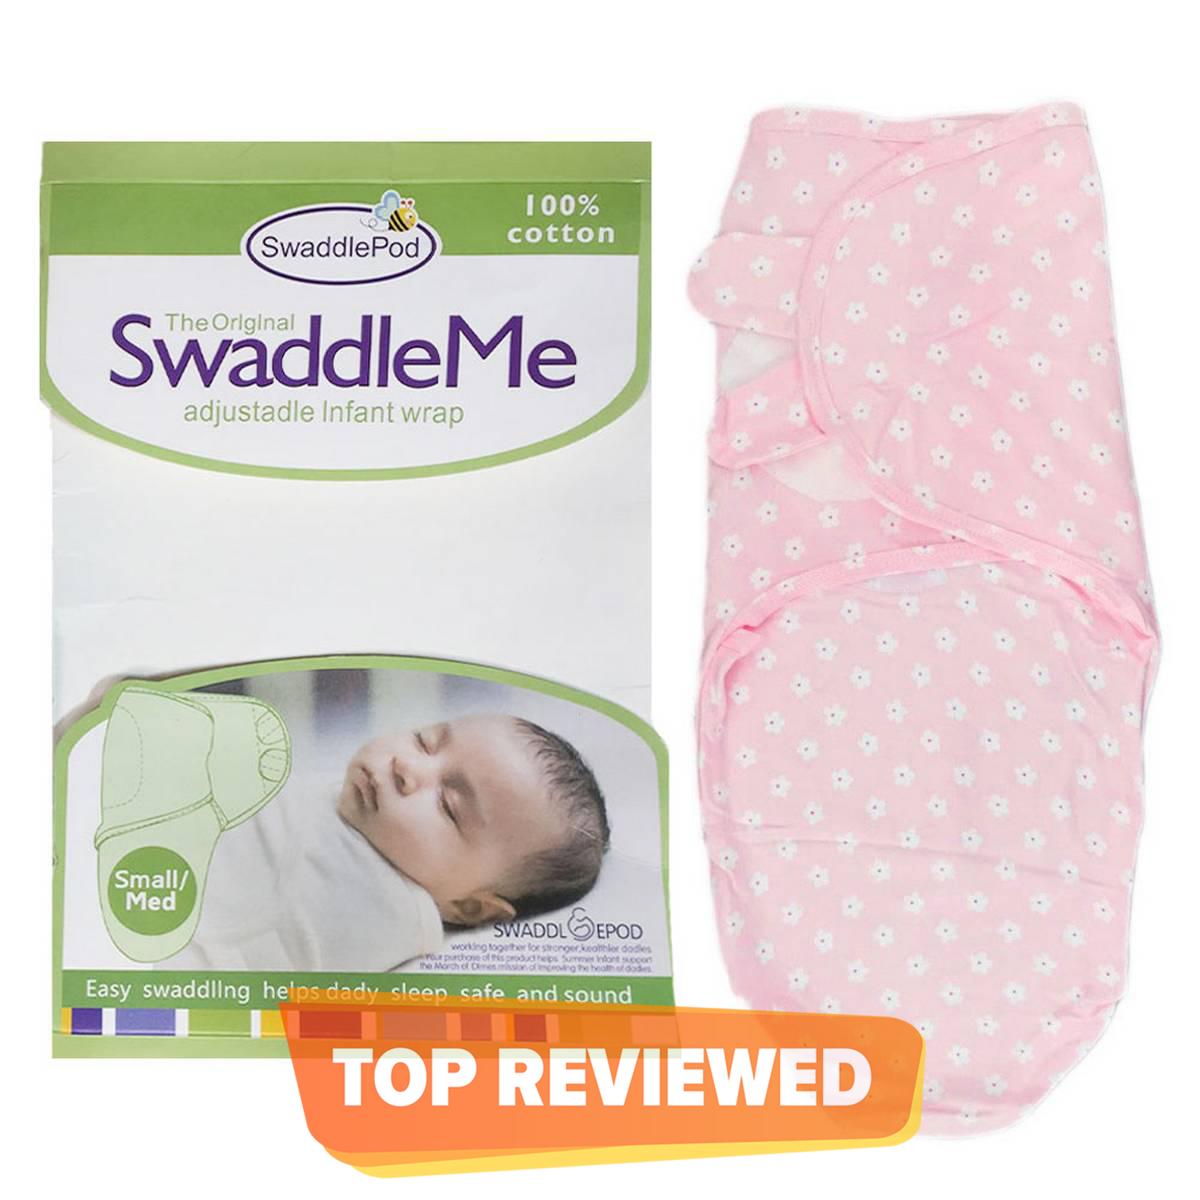 High Quality White Super Soft 100% Cotton SwaddleMe Swaddle Me Ultra Comfort Adjustable Swaddle Infant Baby Wrap - Baby Swaddle Wrap New Born Baby Swaddle Wrap Swaddle Wrapping Sheet Baby Swaddles